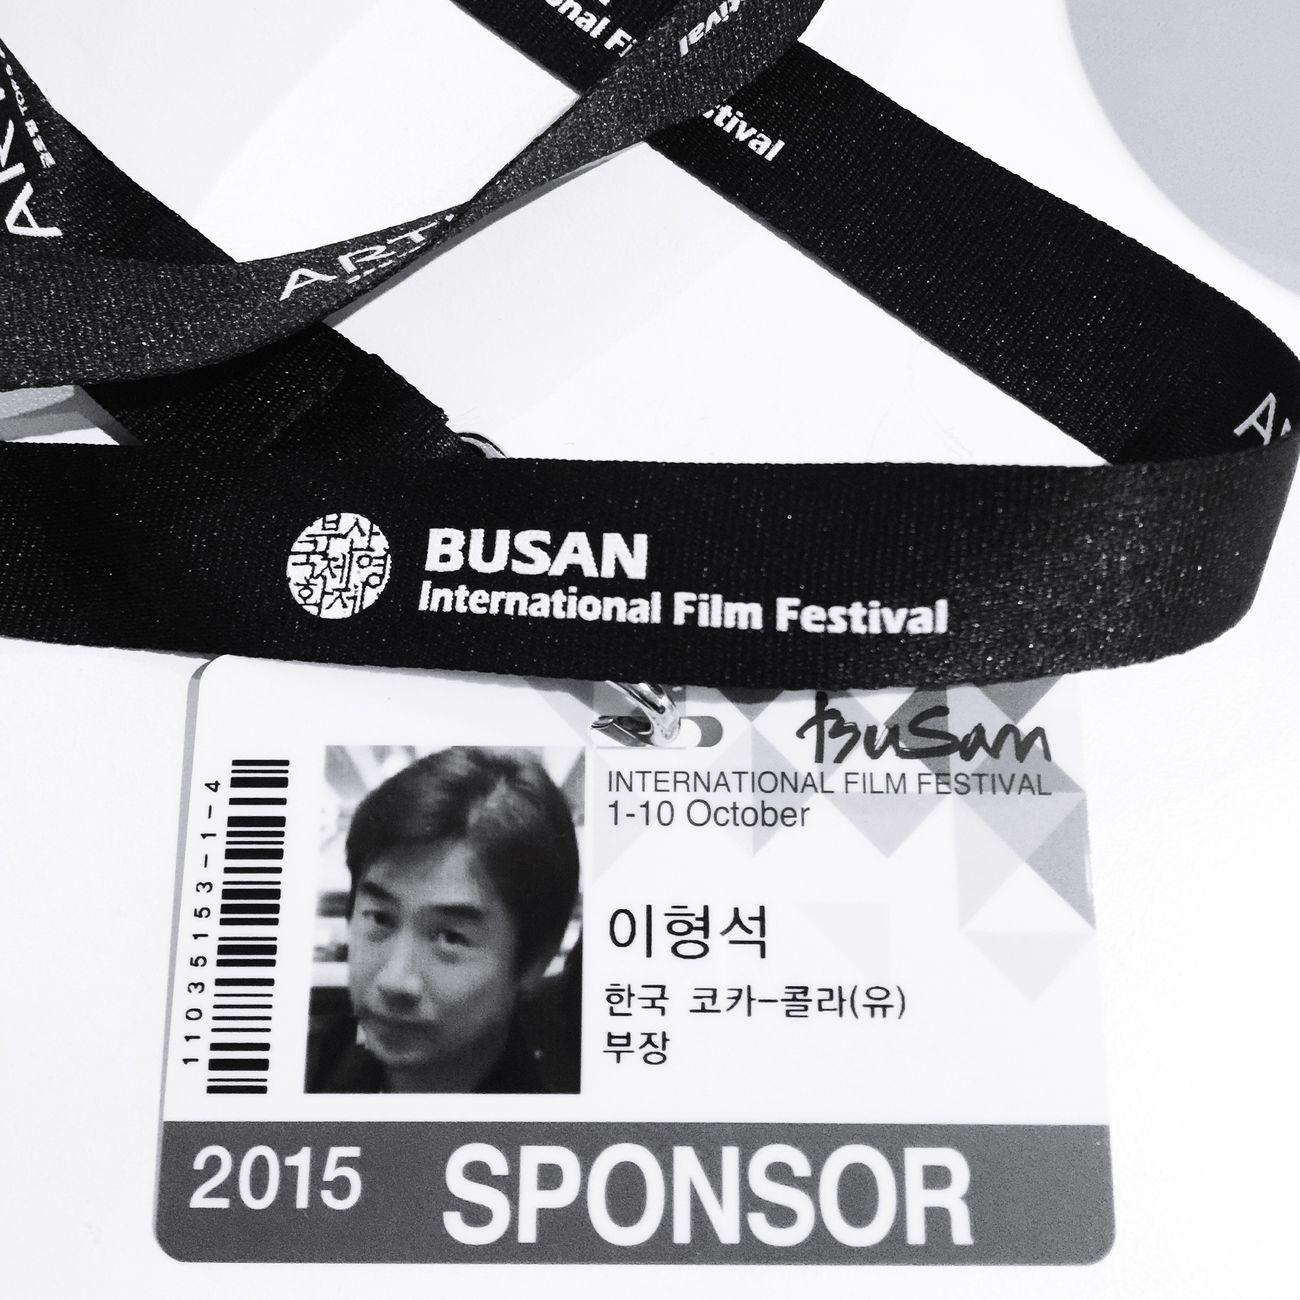 2015 Busan International Film Festival Busan Biff Seagrams Sponsor